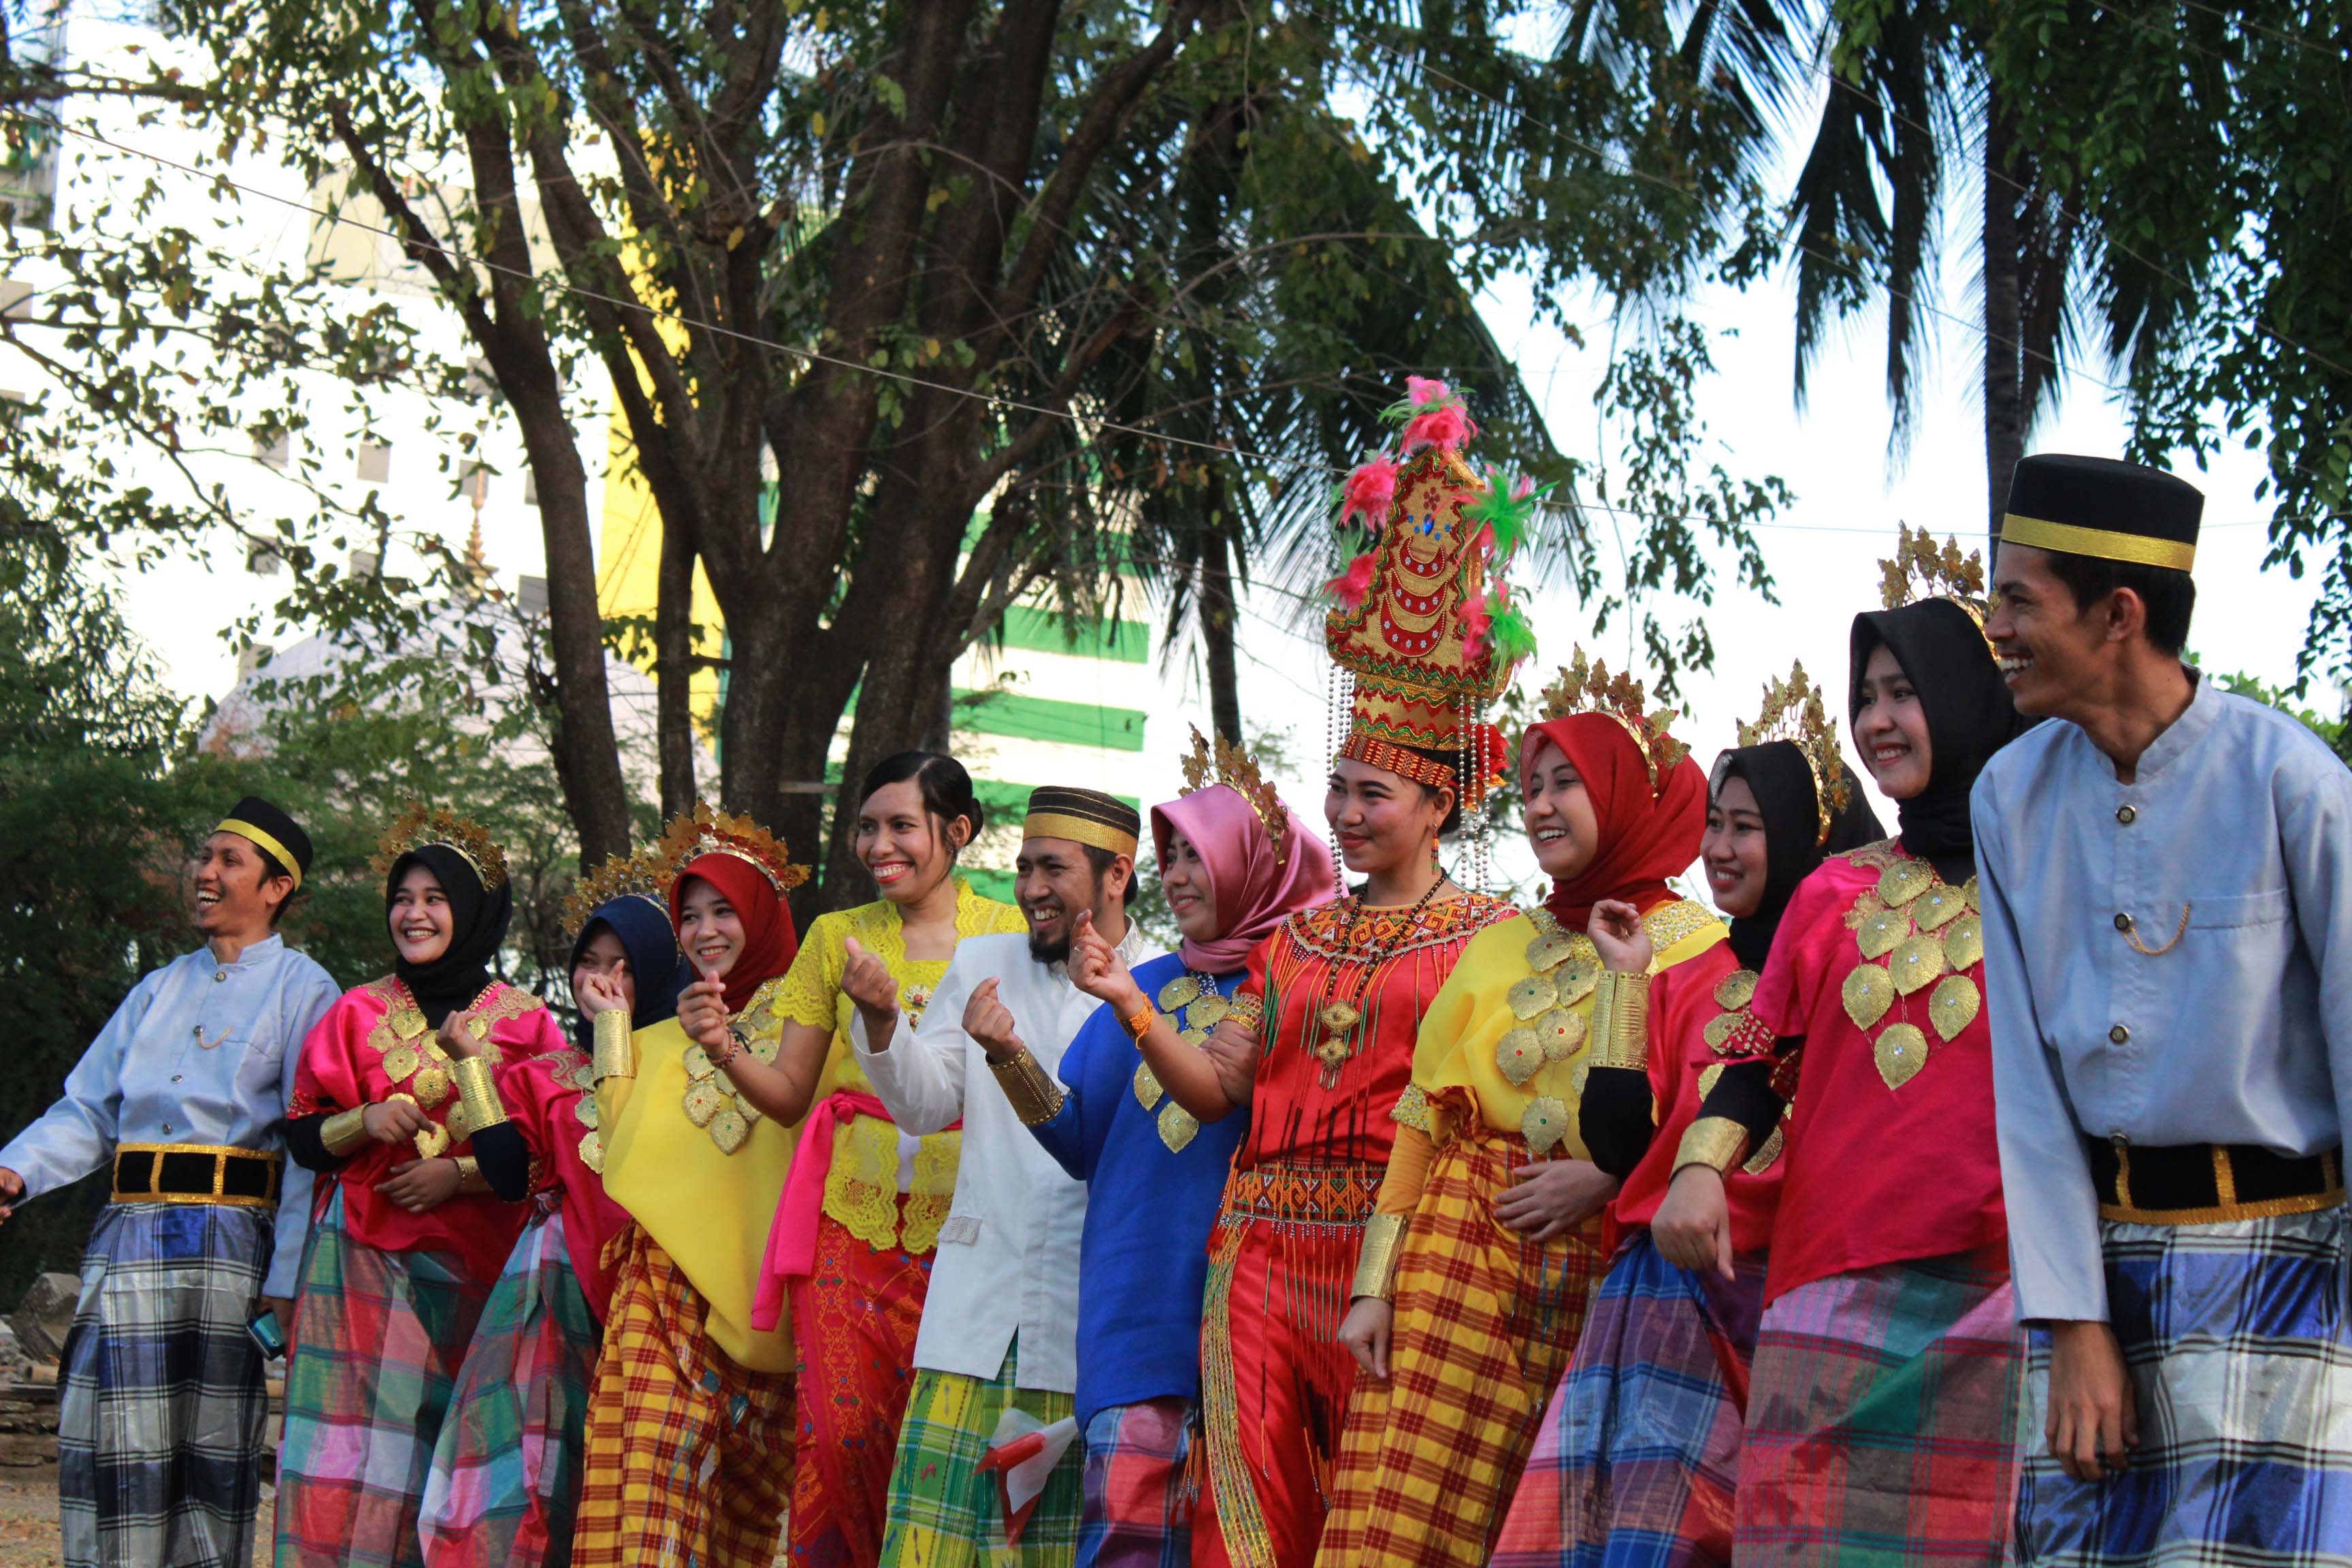 Pembukaan Dies Natalis Ke-33 Tahun, Unibos Ramaikan Dengan Parade Bhineka Tunggal Ika